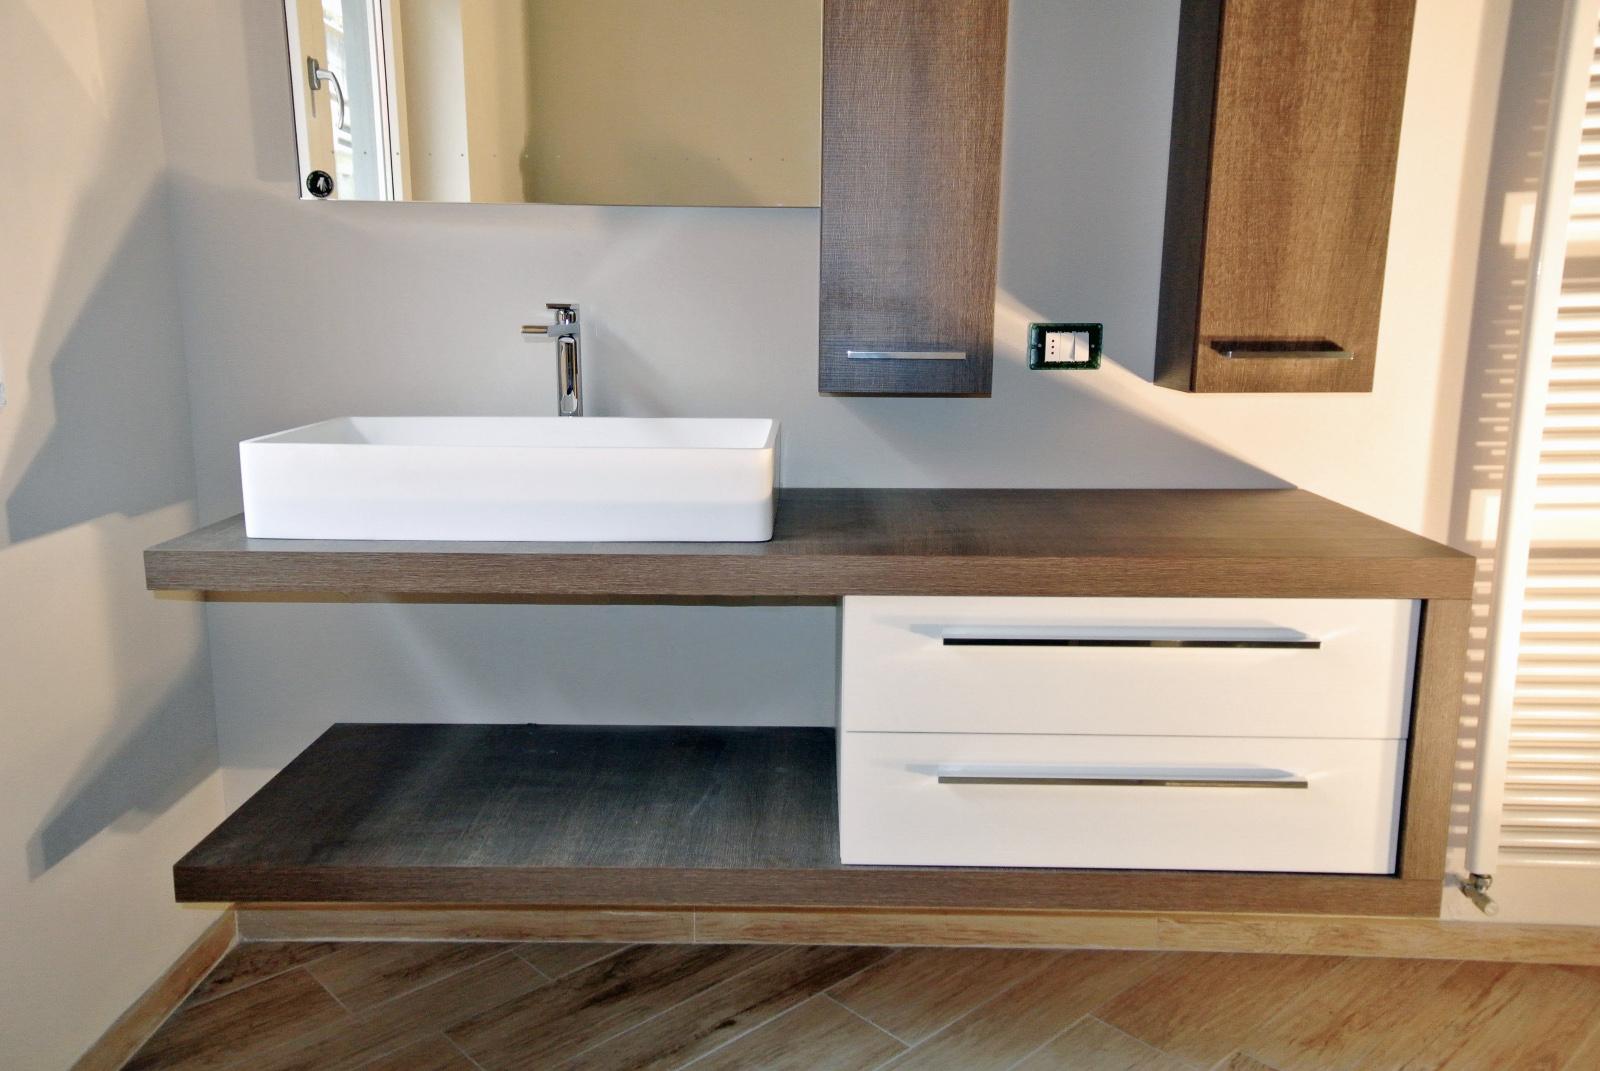 sintesibagno-verbania-arredobagno-lavabo-corian-miscelatore-lavabo-prolungato-bpnomi-bonny-puntotre-elemento-a-c-laminato-matrix-puntotre